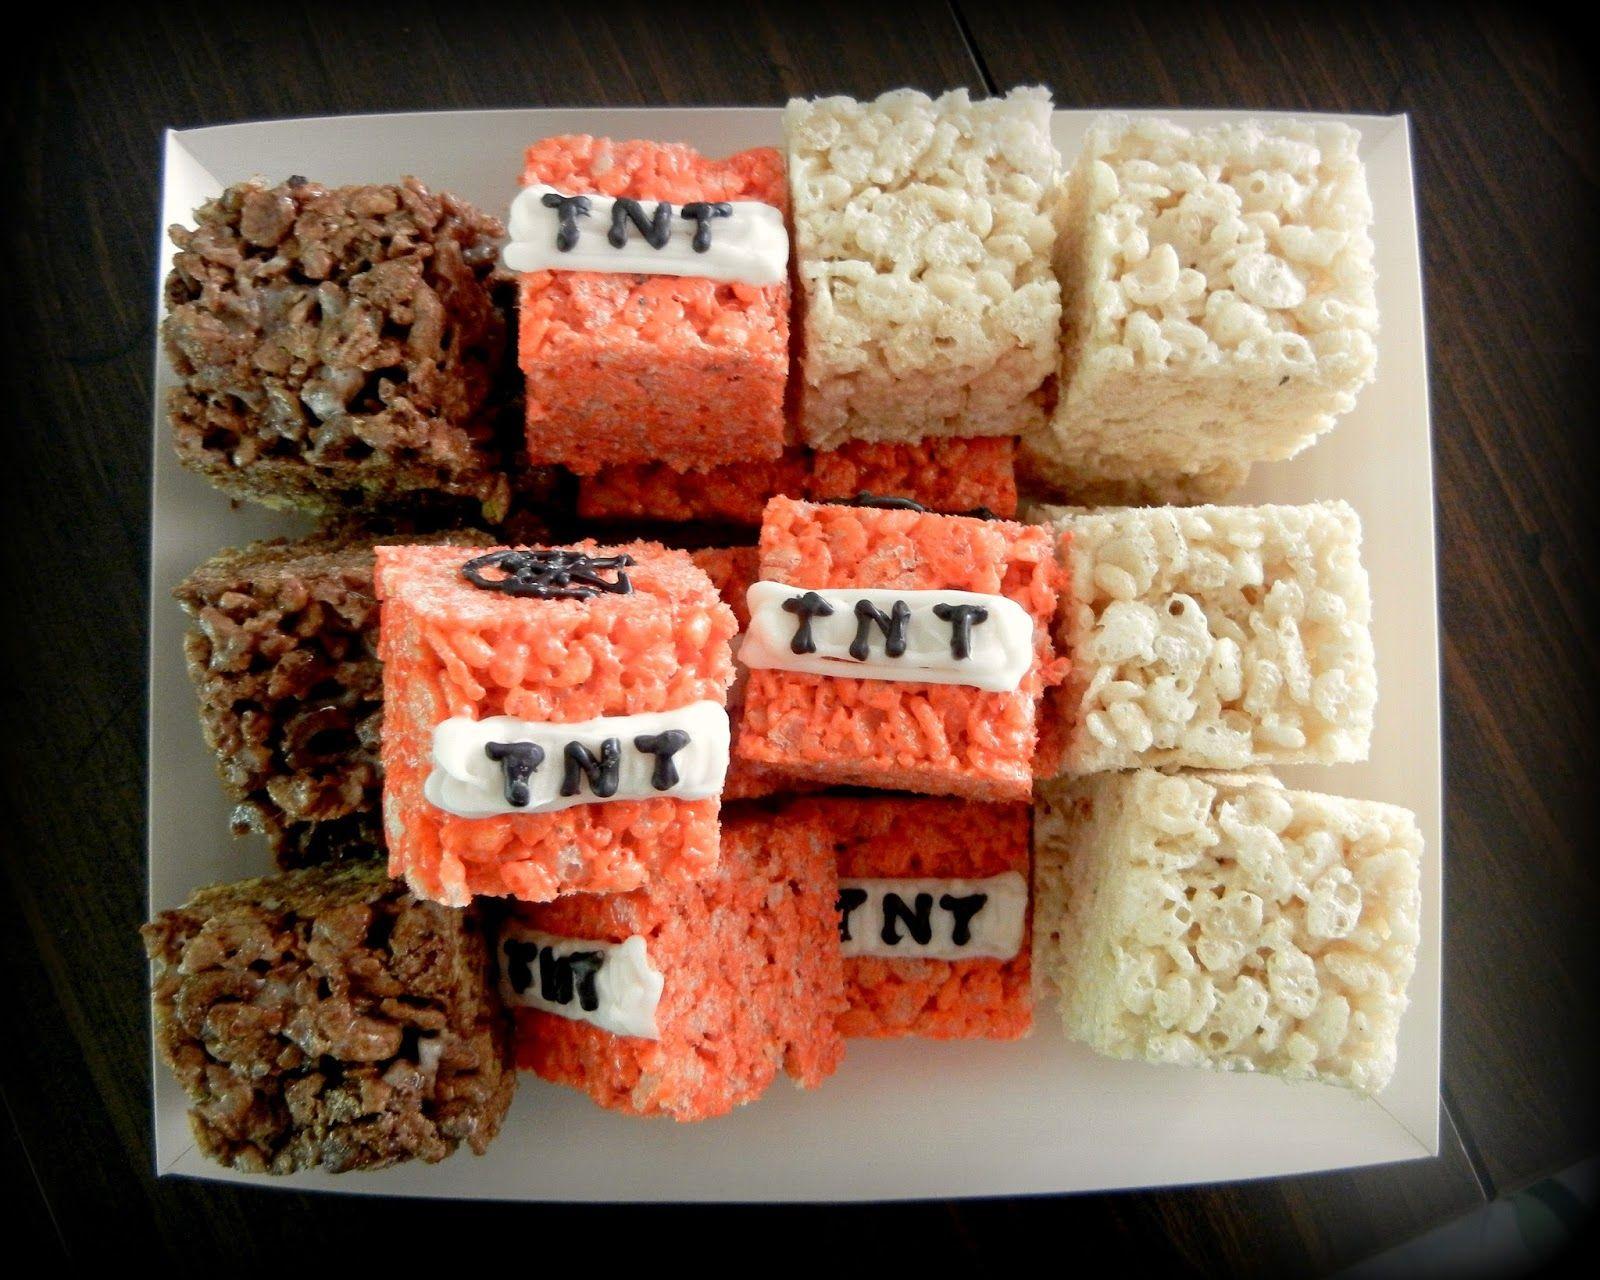 Minecraft rice crispy cake minecraft cake and treats would love minecraft rice crispy cake minecraft cake and treats would love to make the tnts forumfinder Choice Image